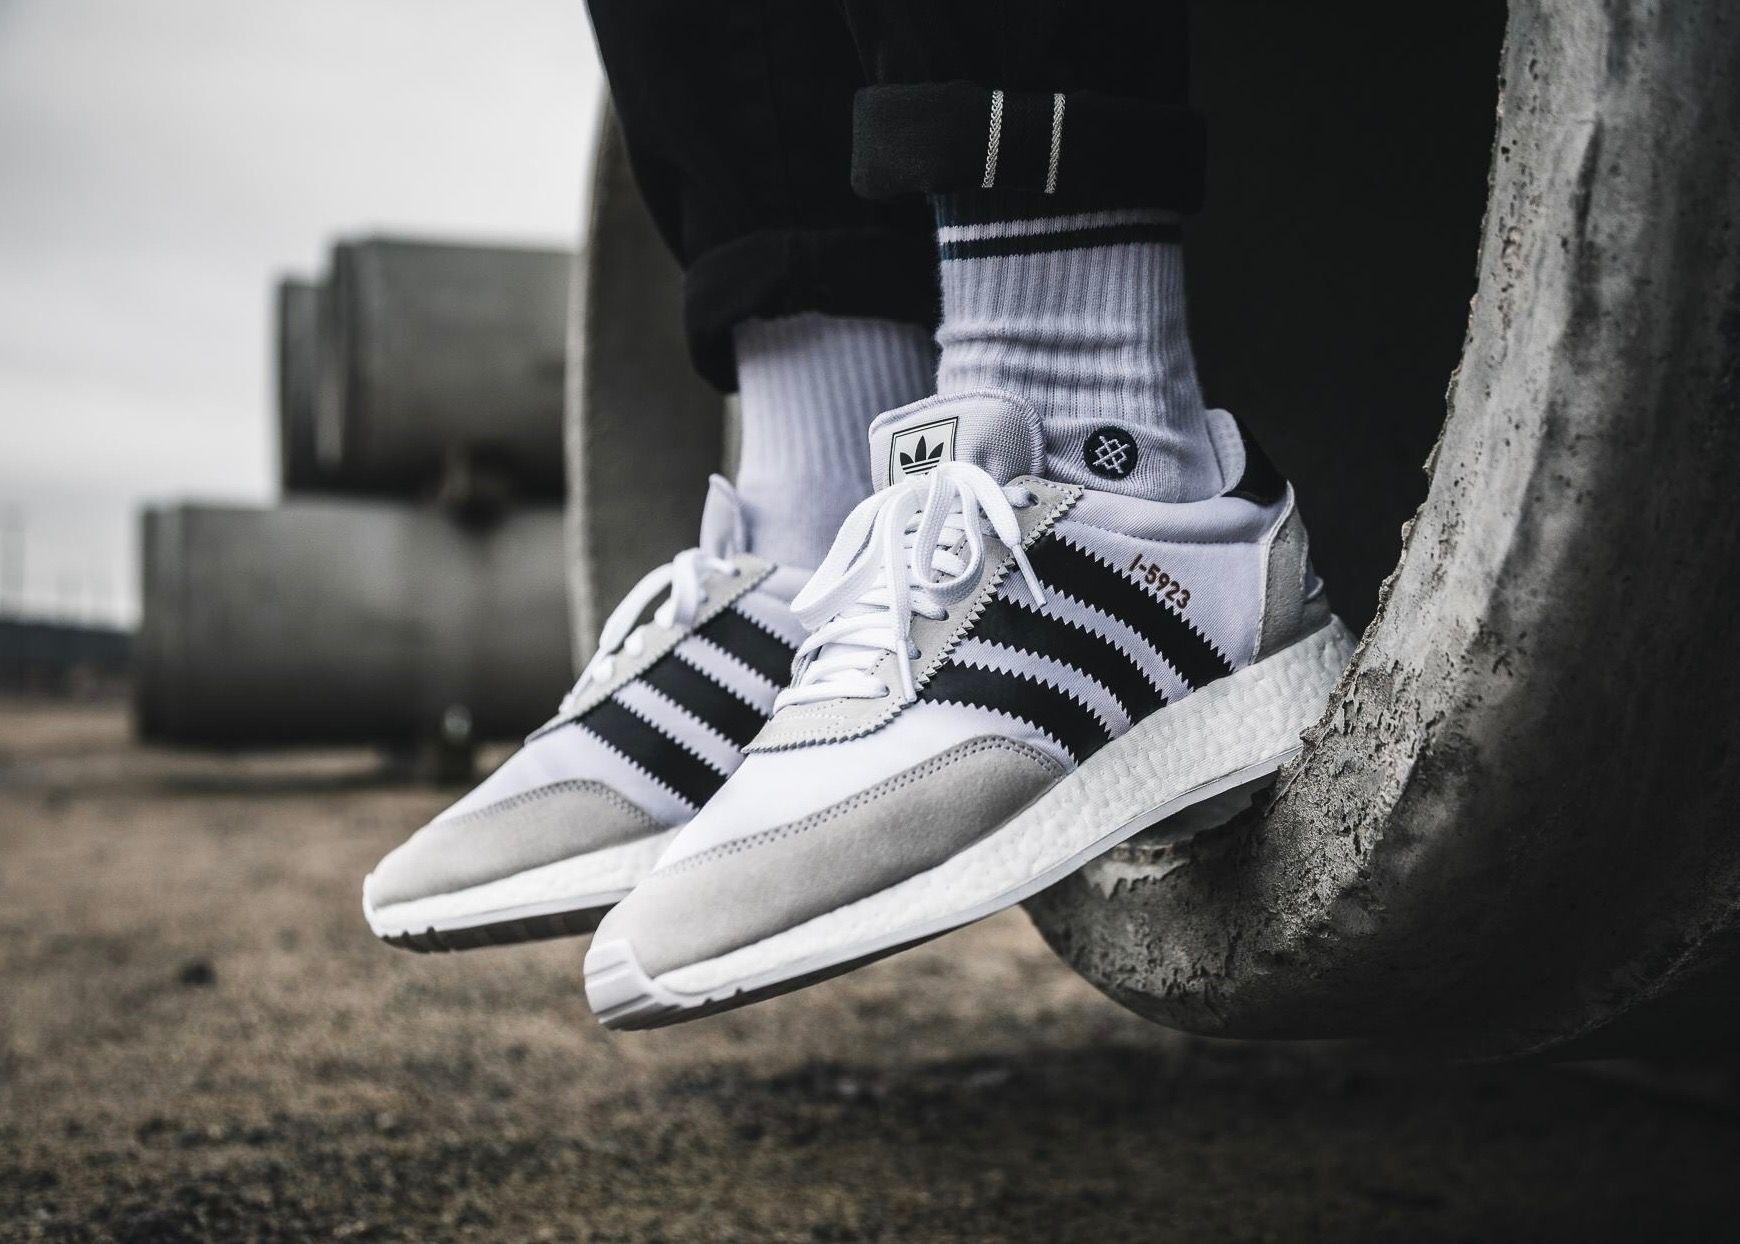 adidas Originals I5923 Sneakers, Adidas iniki, Mens